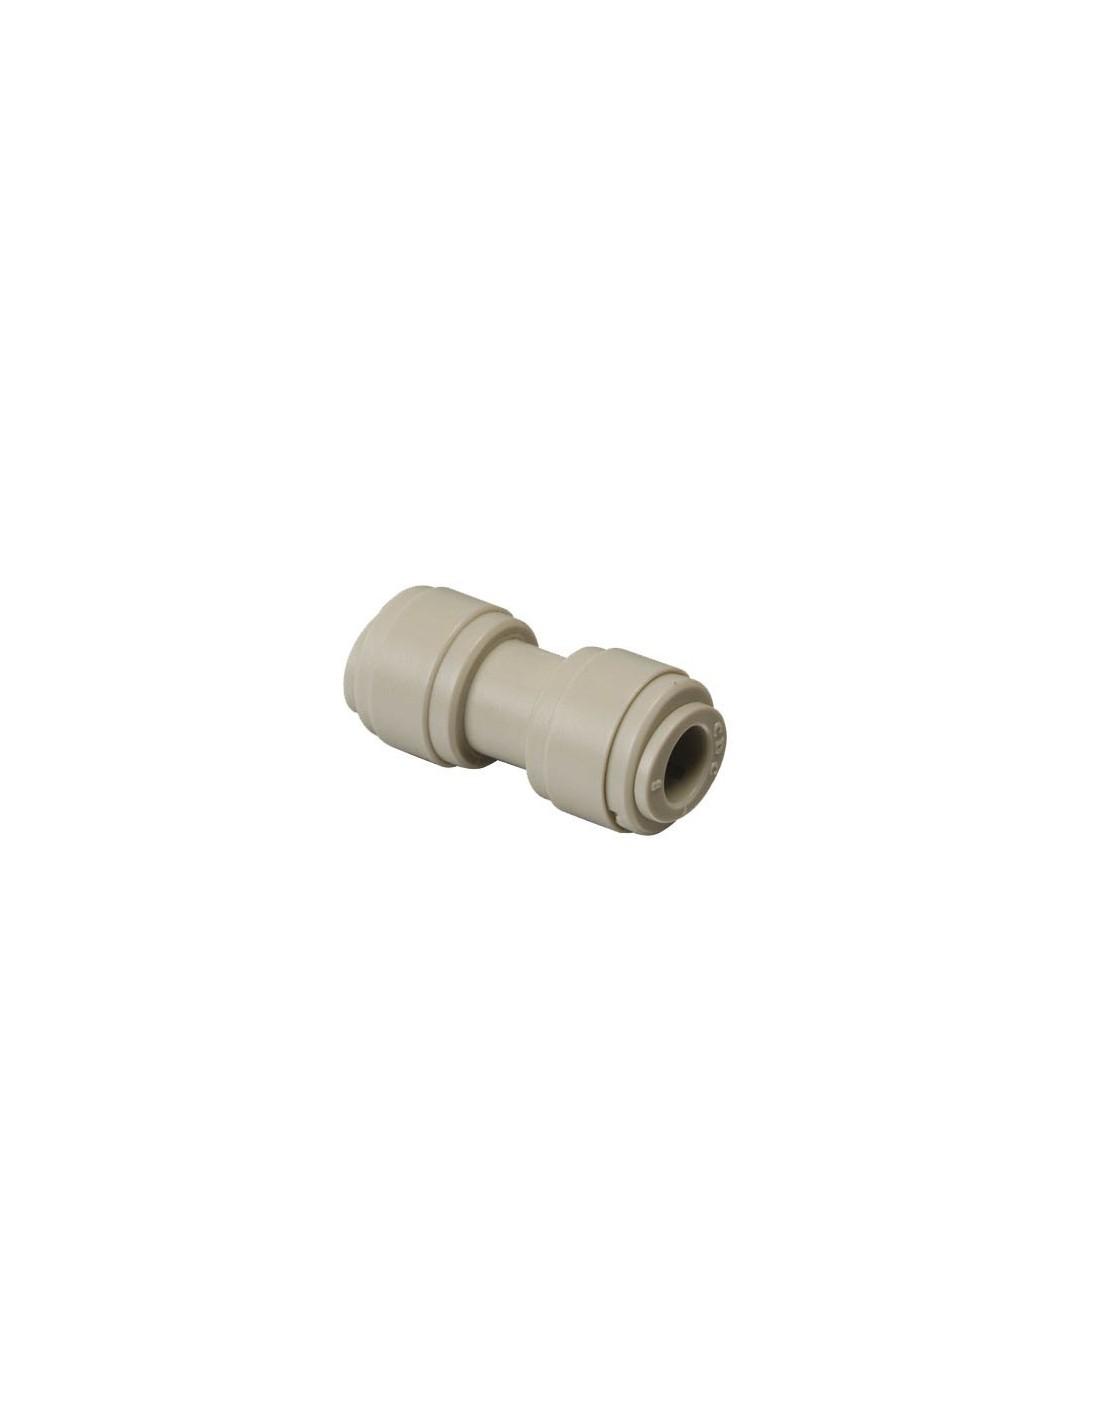 HUC-I - FluidFit HUC Union connector (inch)